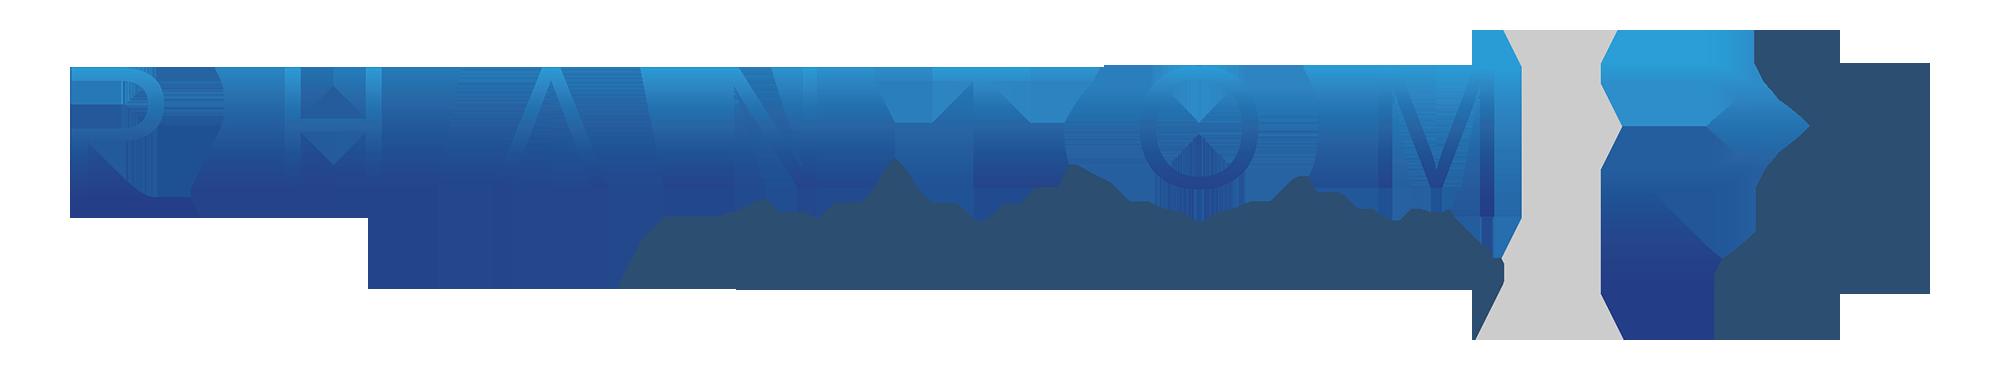 Phantom Engineering